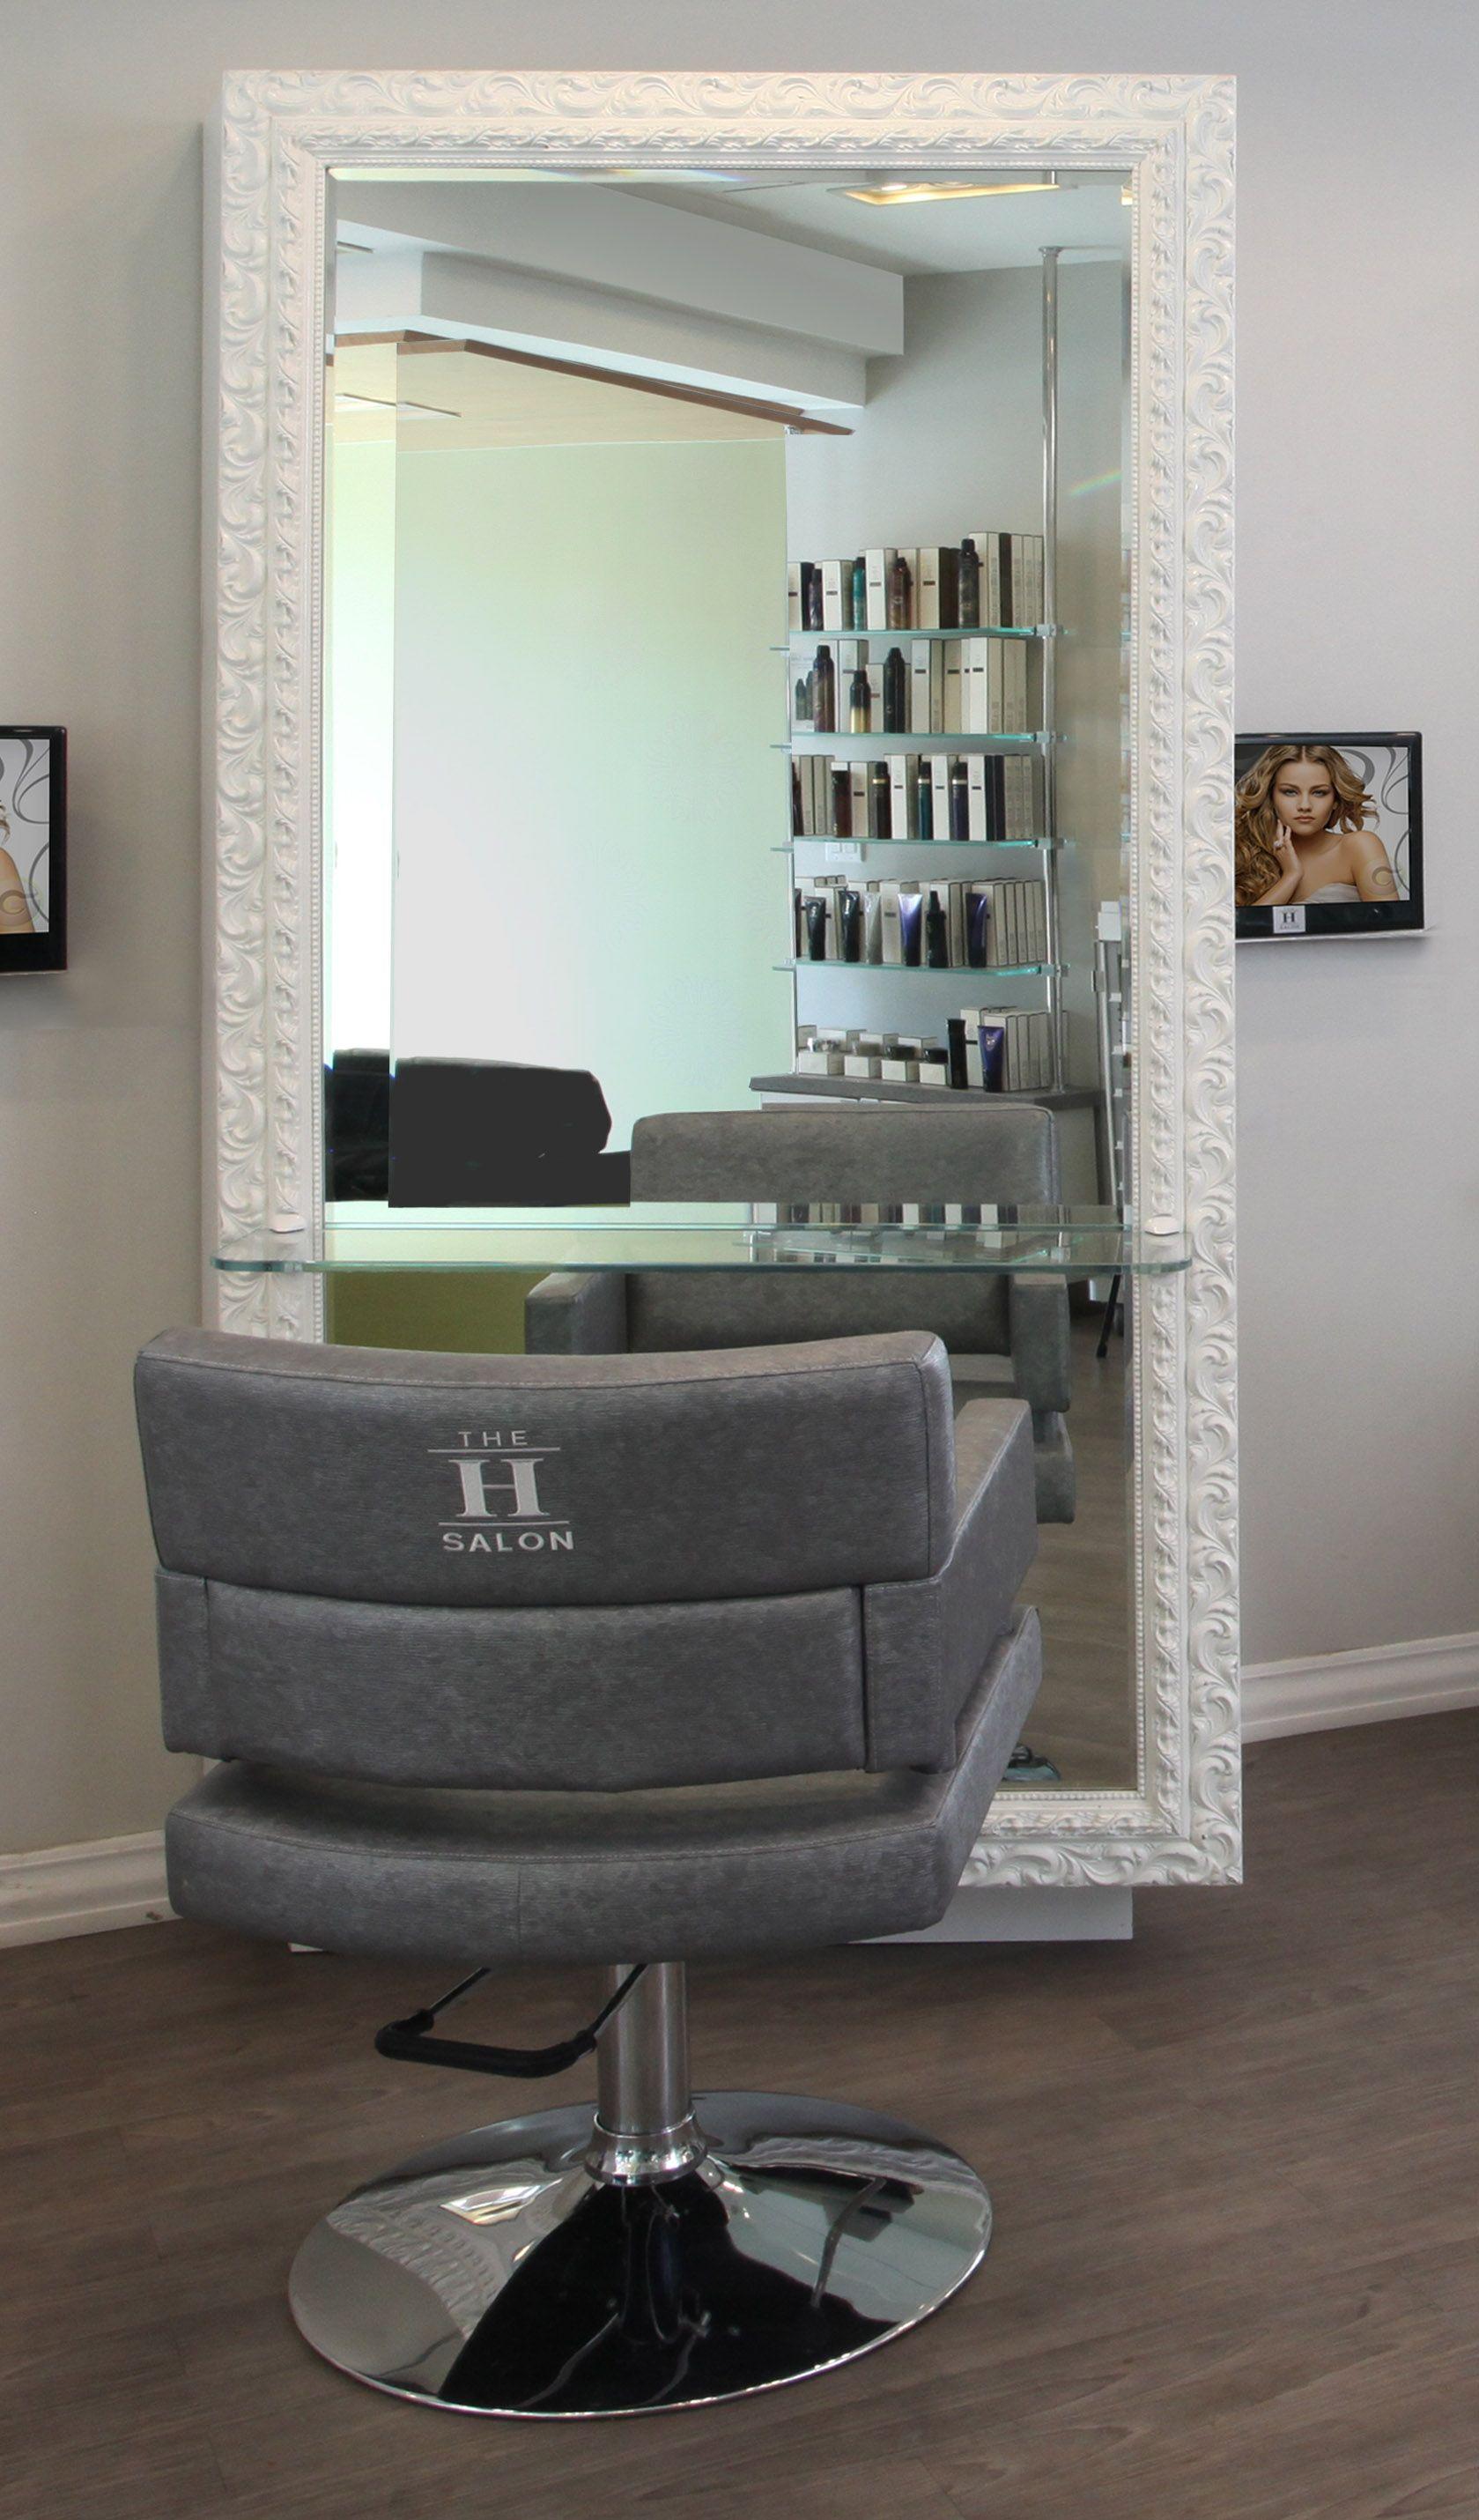 #clientstation #interiordesign #chair #largemirror #woodfloors #hairsalon  #design #archinteriors